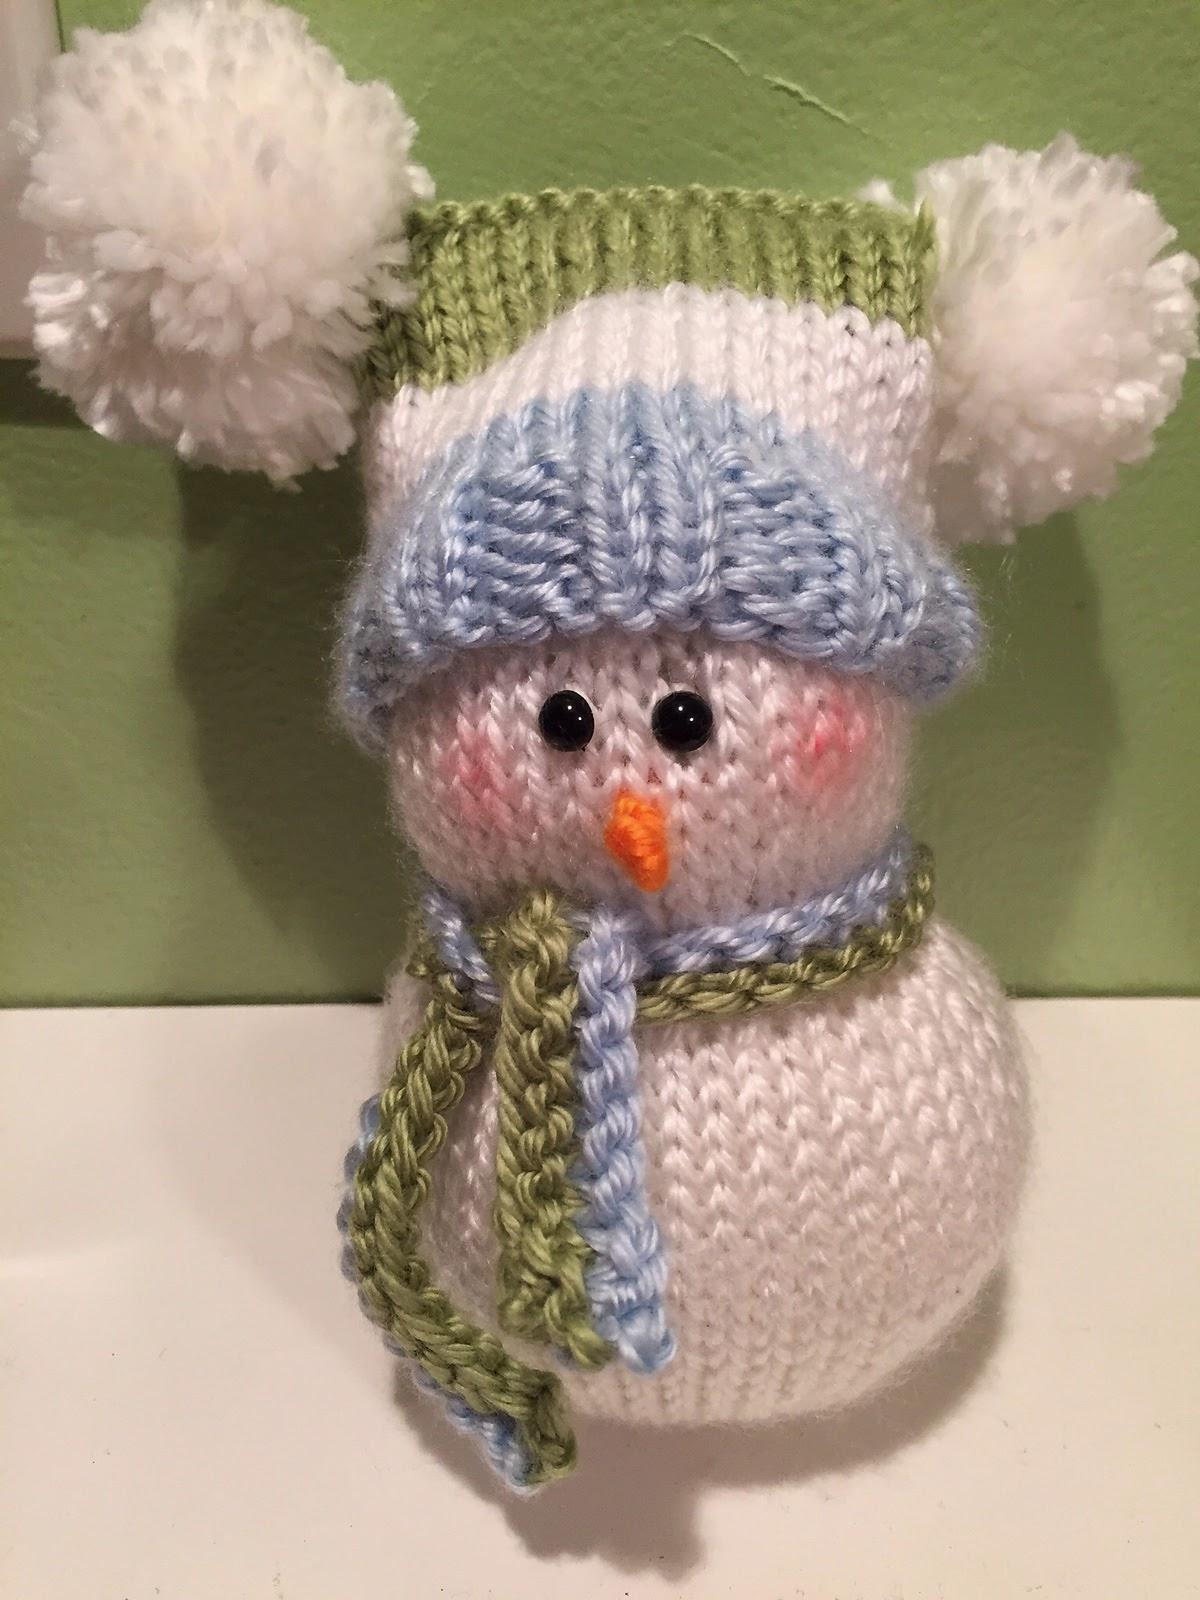 Knitted Snowman Pattern Free : cheryls blog: Knitted Snowman Pattern